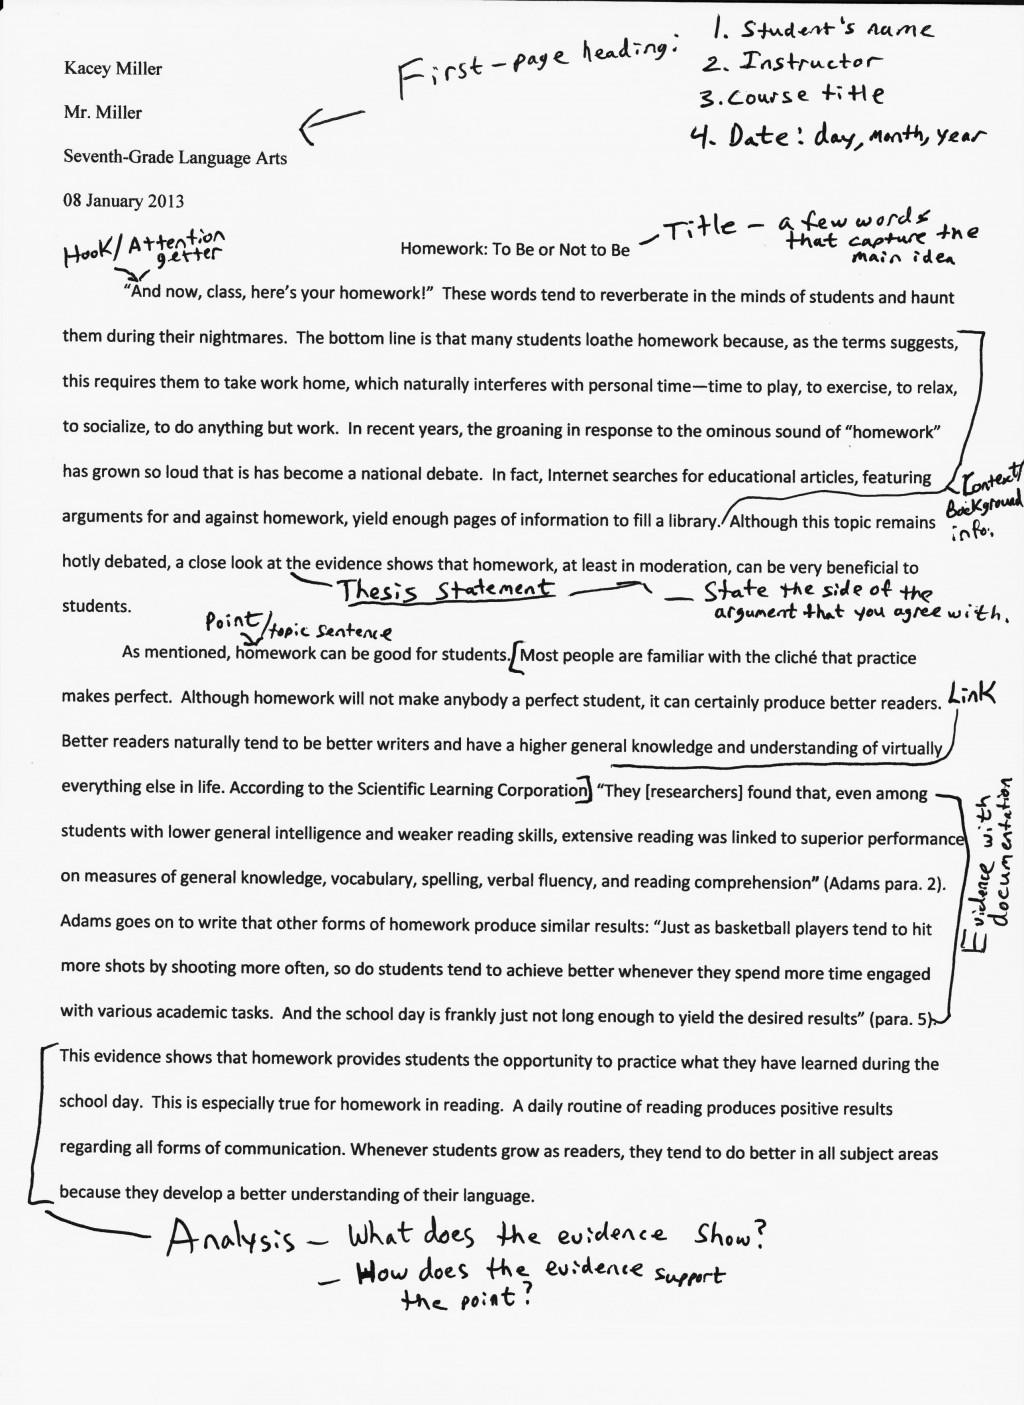 014 Mentor20argument20essay20page20120001 Essay Example College Frightening Bad Essays Worst Reddit Funny Prompts Large